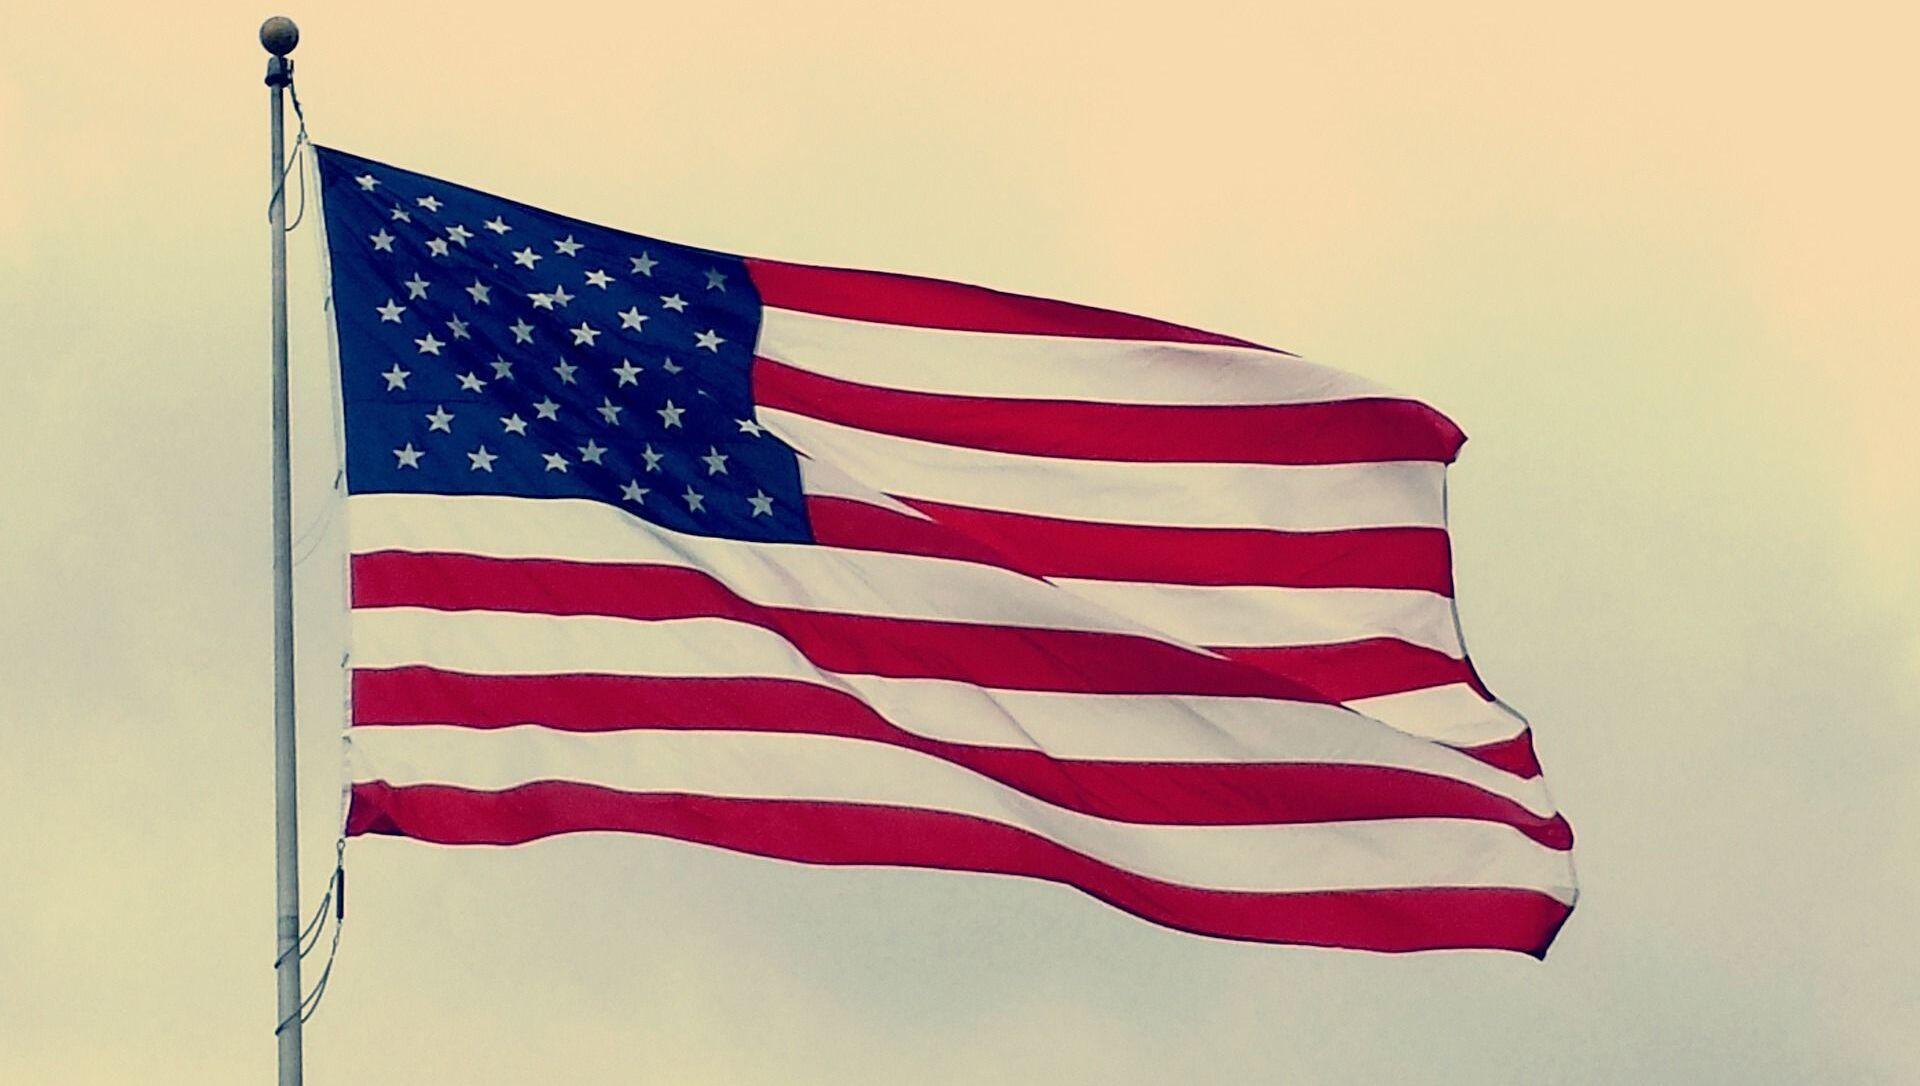 Un drapeau américain - Sputnik France, 1920, 06.08.2021